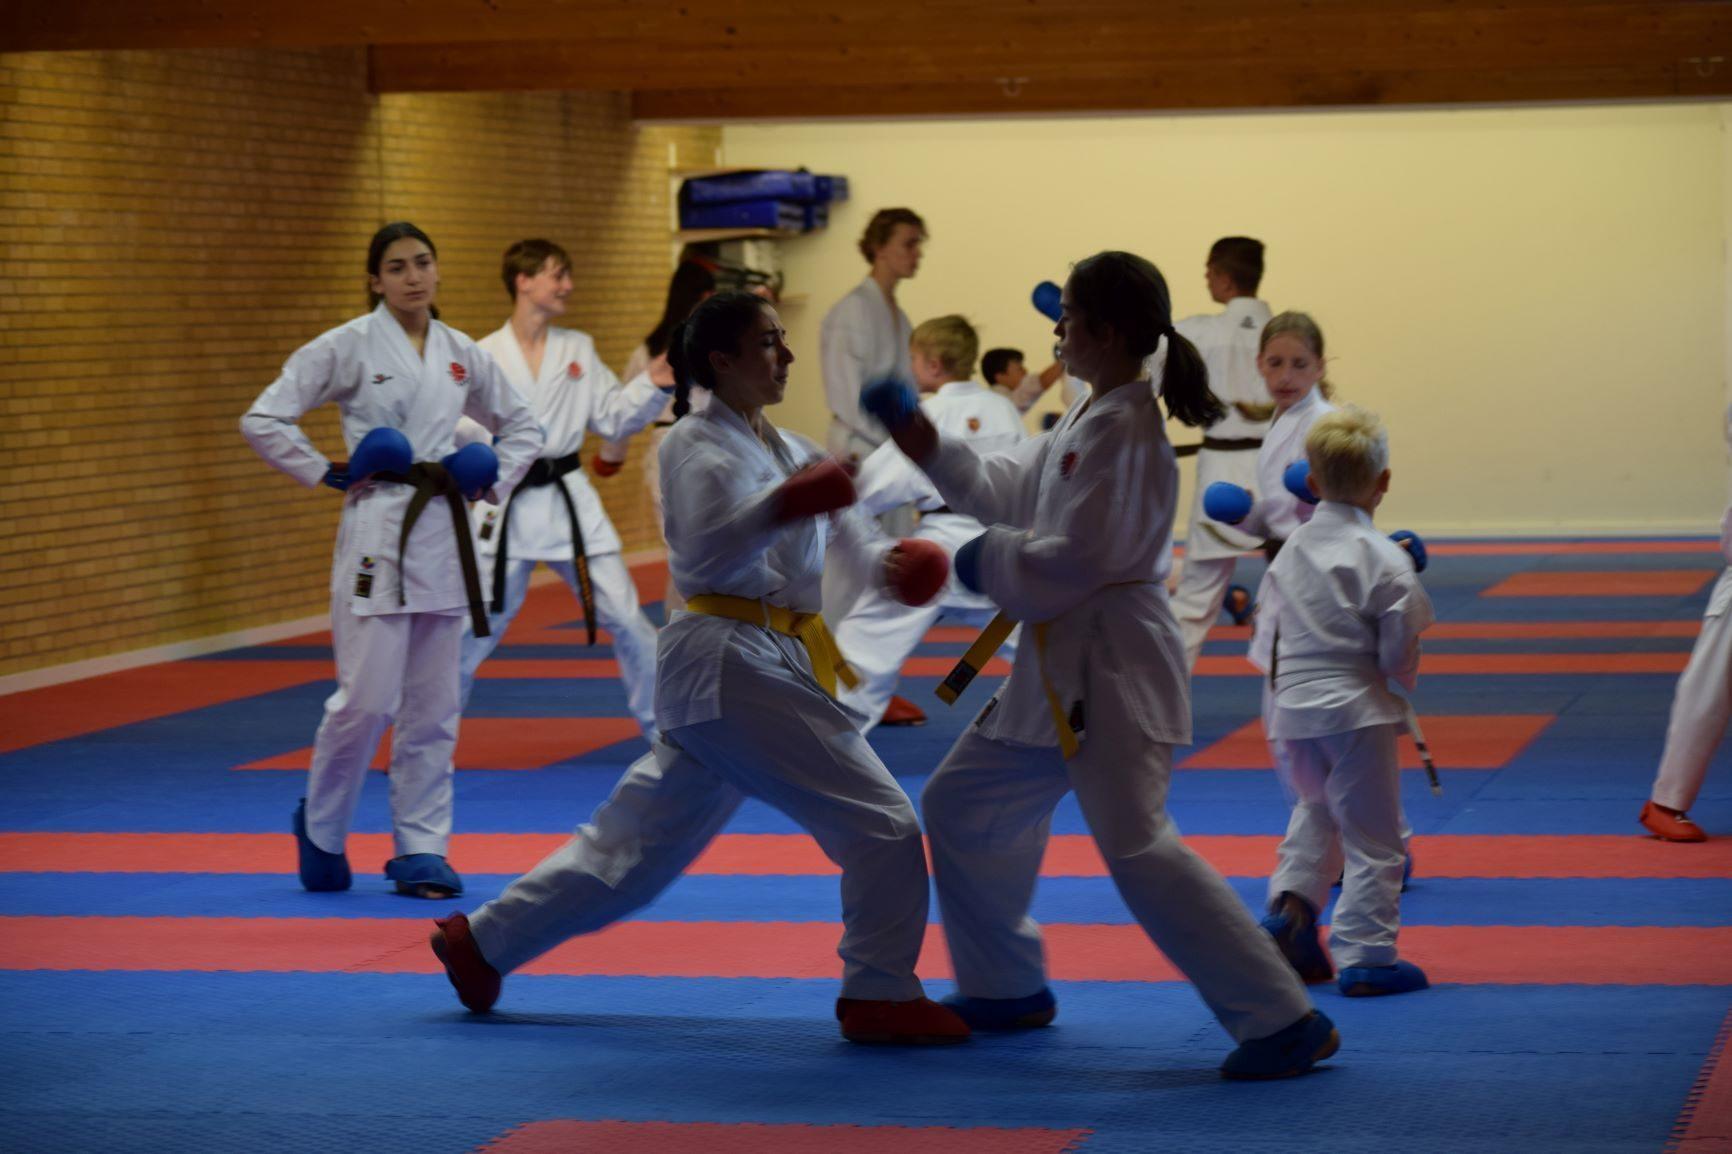 Dyrk sport - ikke administration, træning i Kaizen Karate Do, Kolding, Motivu rekrutterer medlemmer til idrætsforeninger